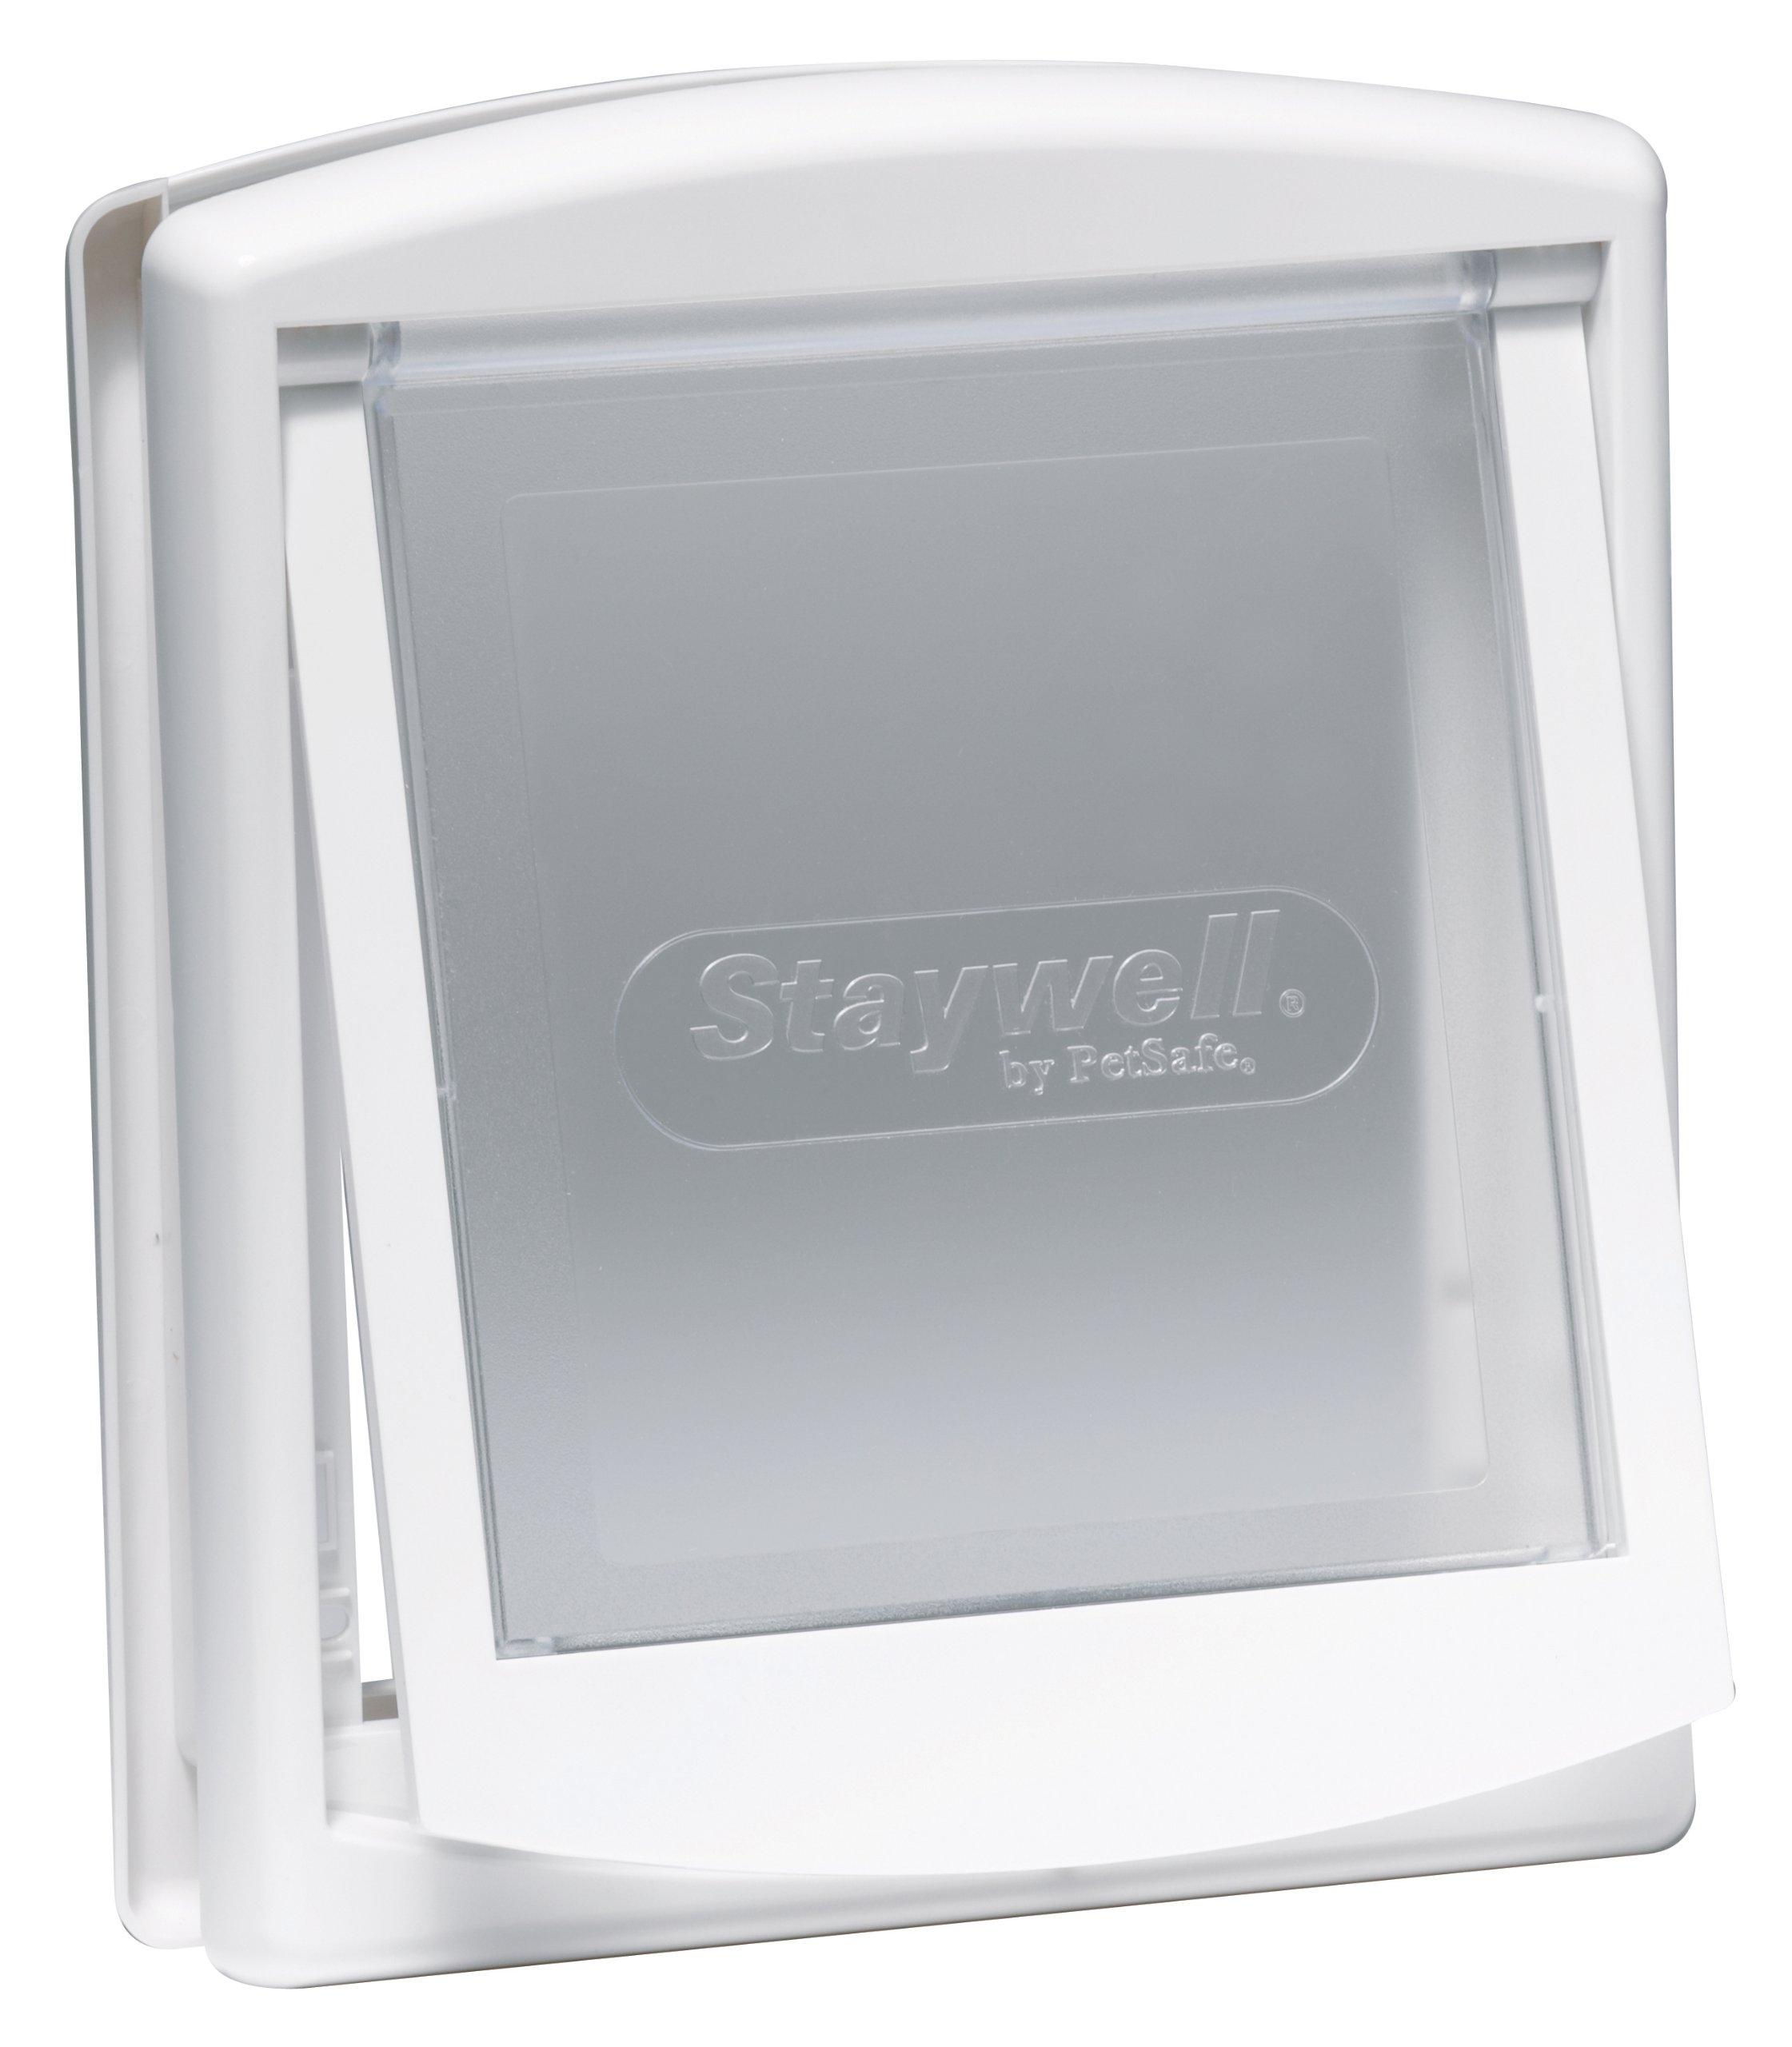 Staywell Original 2-Way Pet Door, Small, White